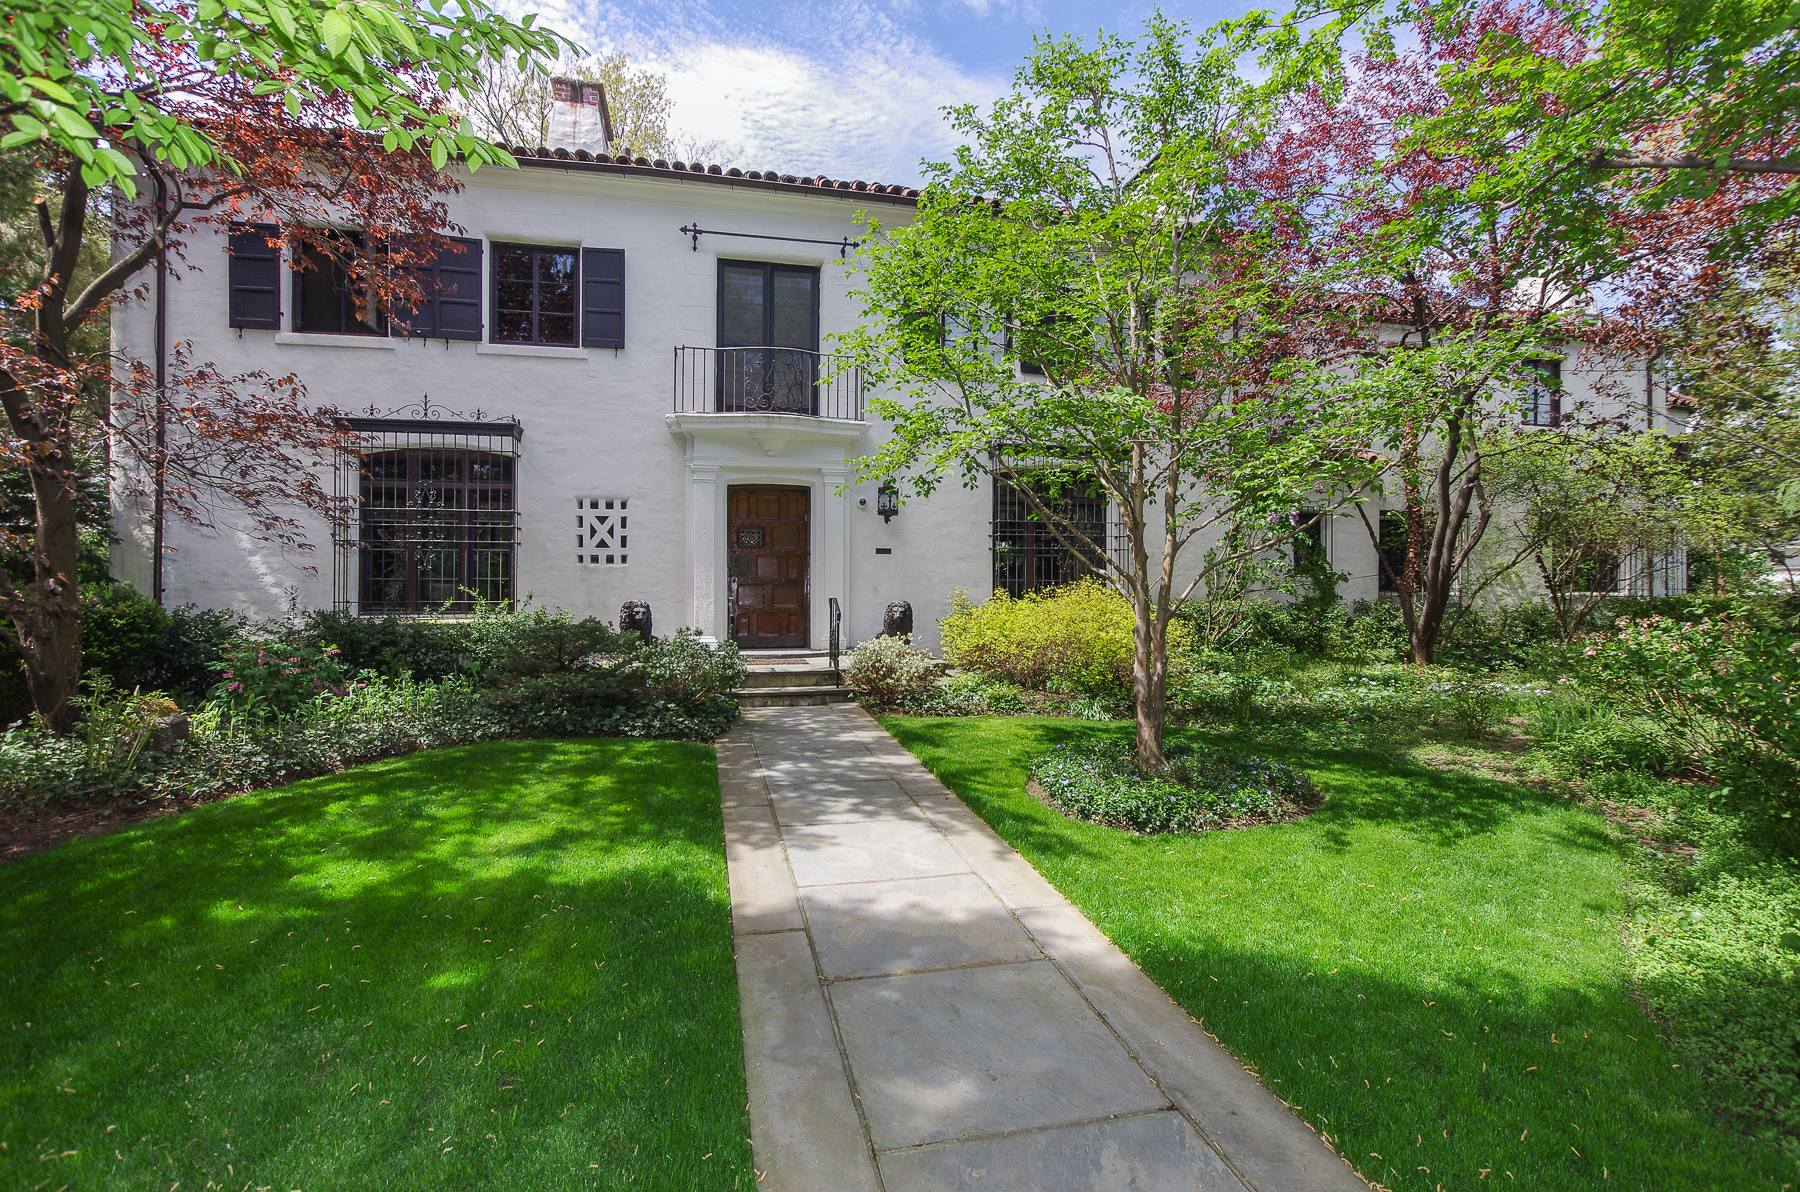 独户住宅 为 销售 在 Dwight Baum Mediterranean Spanish Revival 5021 Iselin Avenue Riverdale, 纽约州 10471 美国